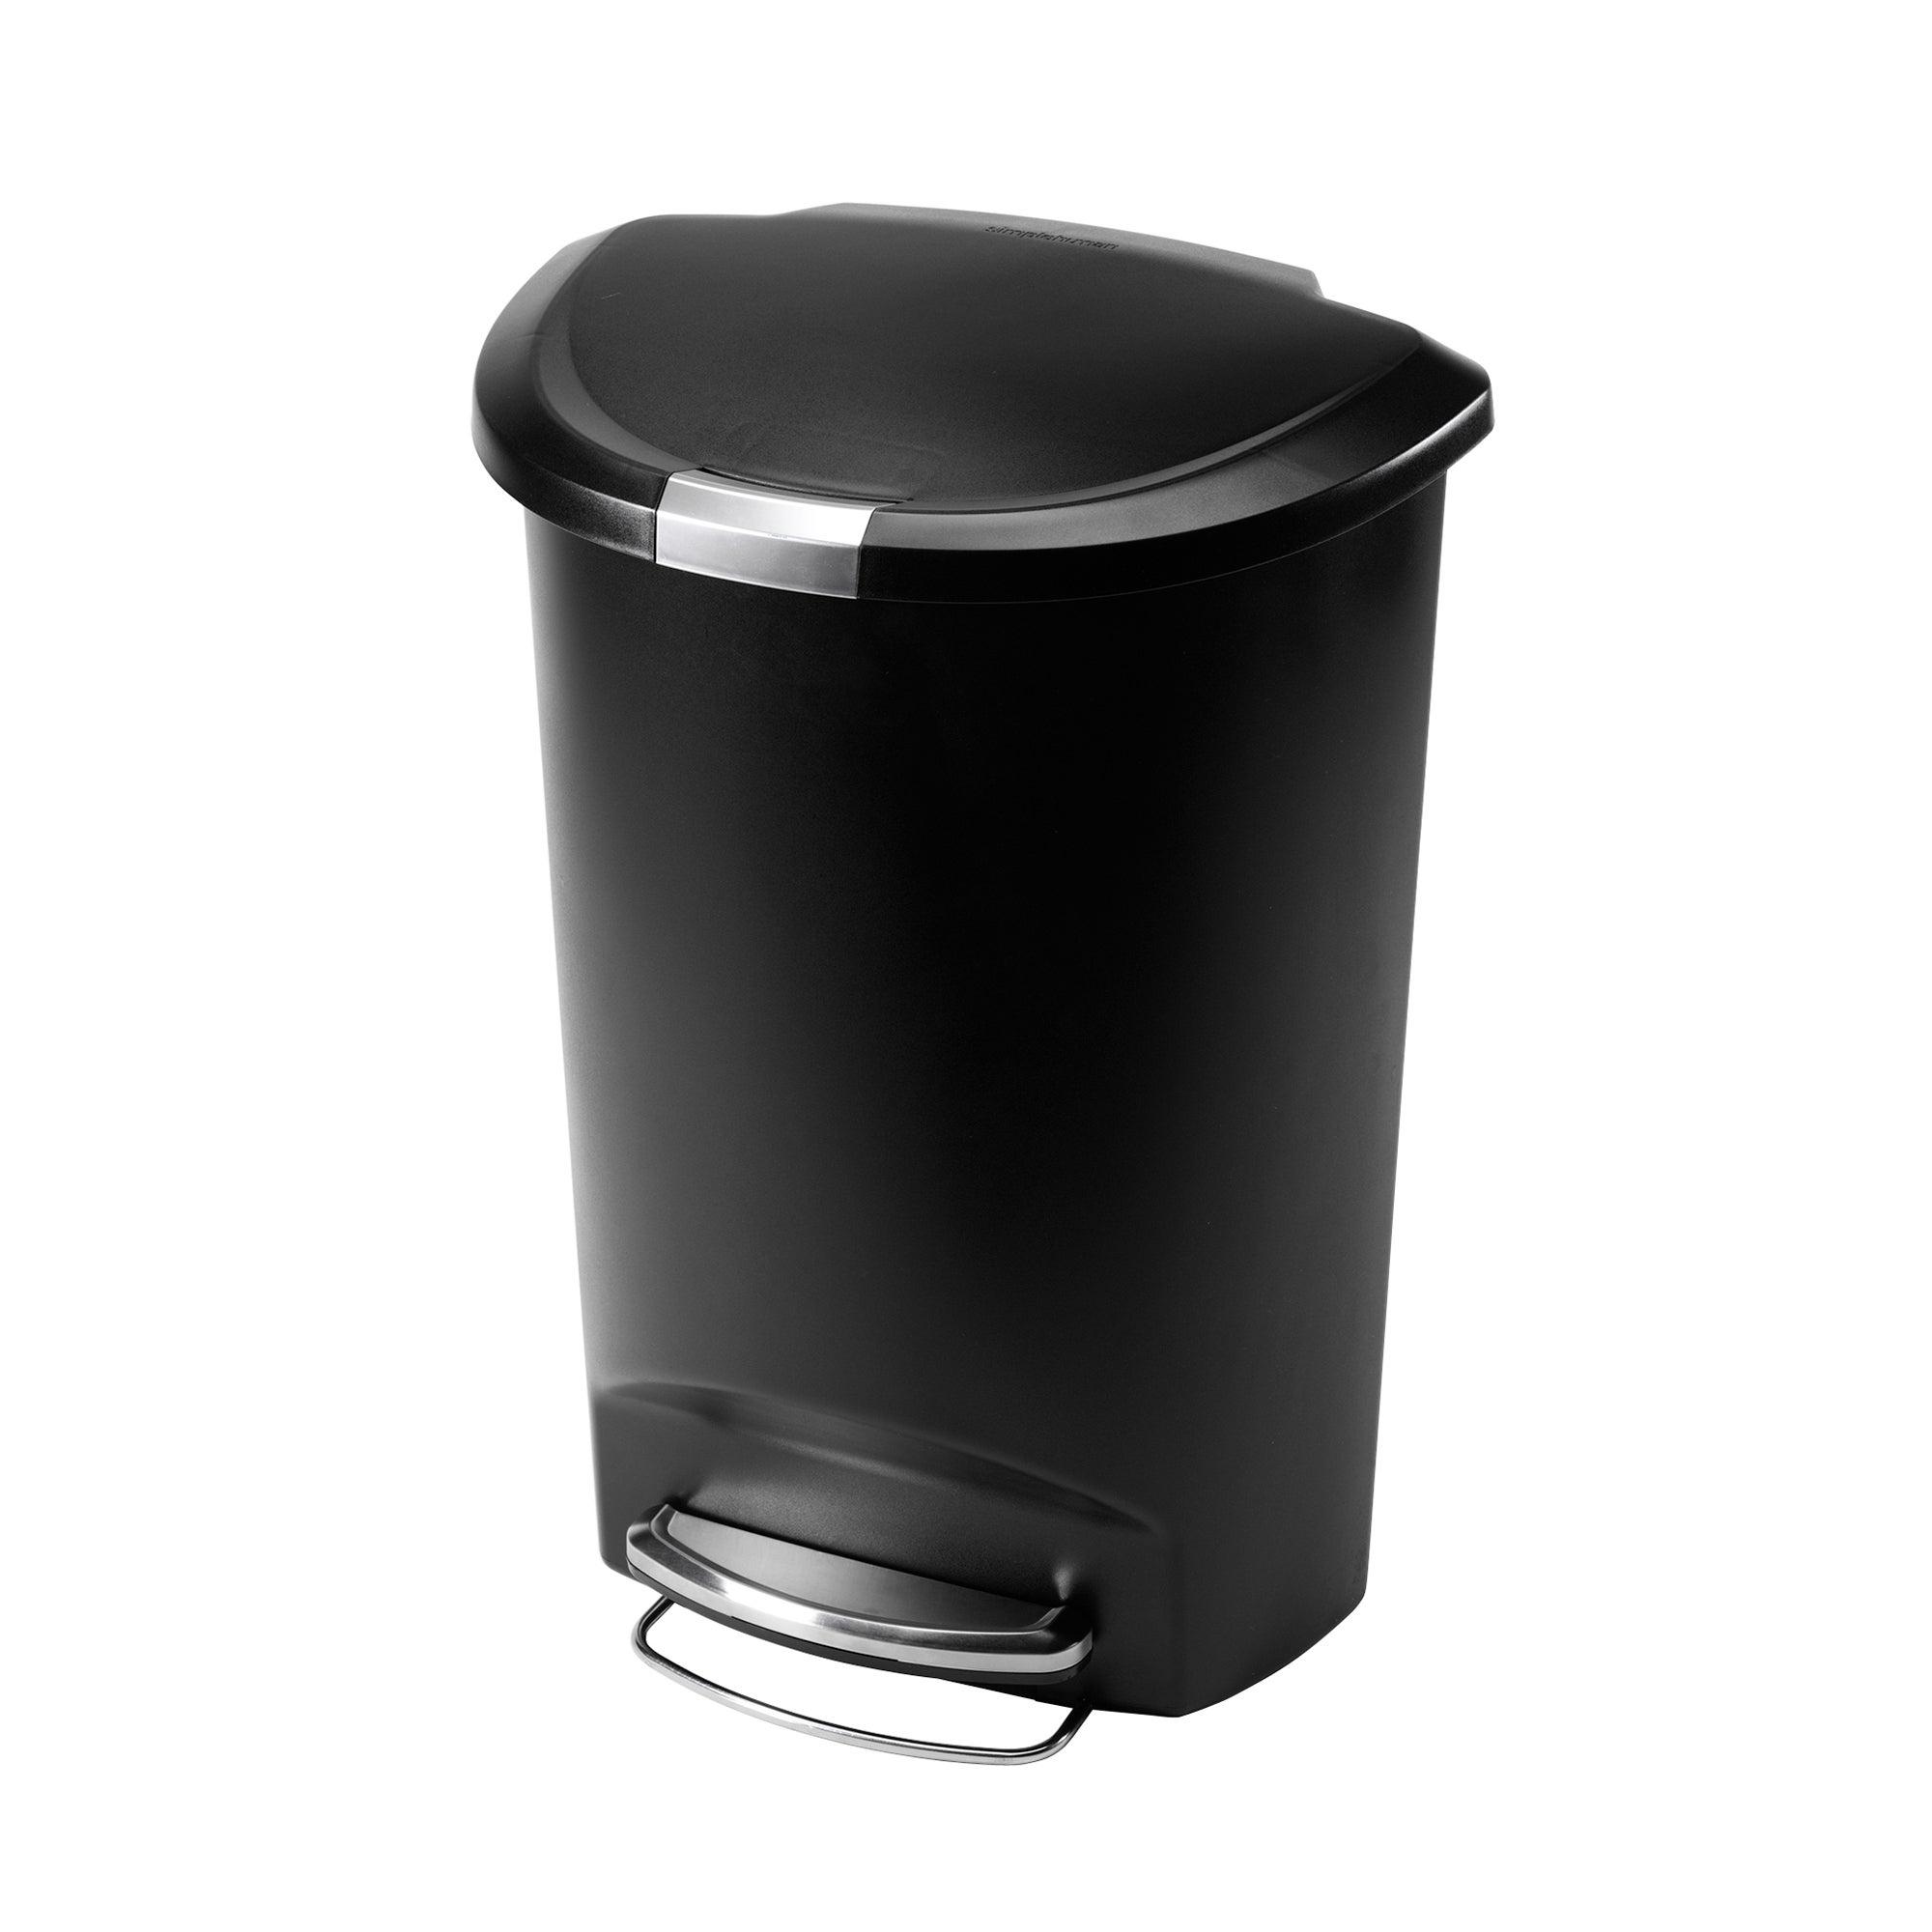 simplehuman 50 Litre Semi Round Plastic Black Pedal Bin